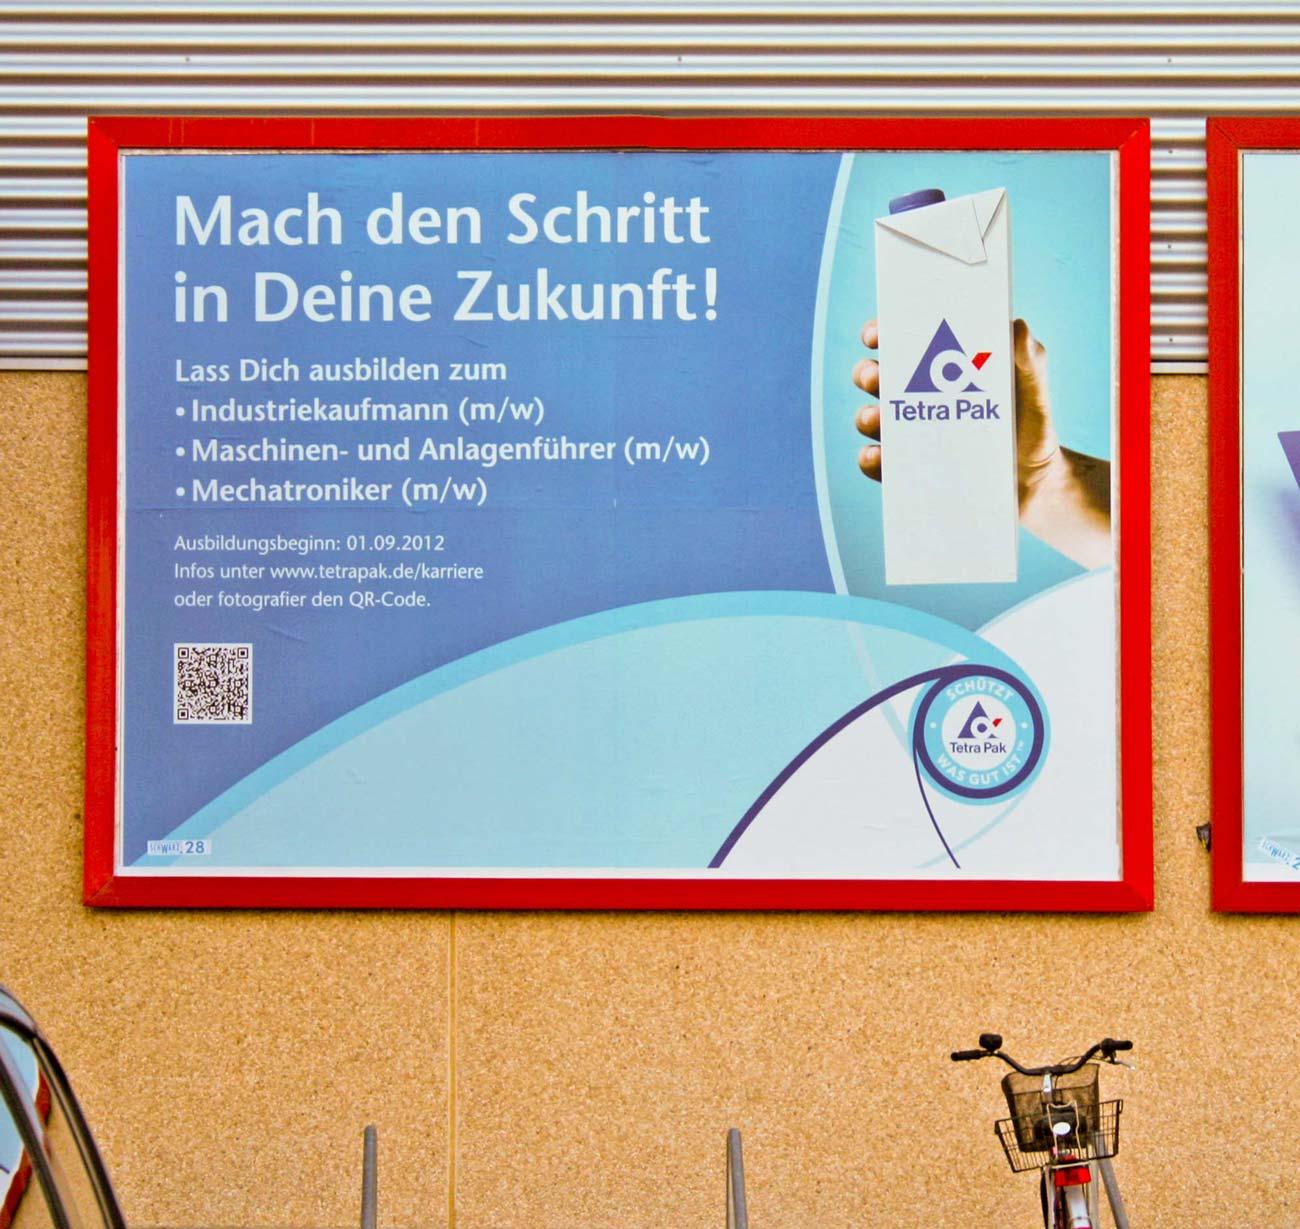 aussenwerbung gro fl chenplakat tetra pak stilelement werbeagentur berlin. Black Bedroom Furniture Sets. Home Design Ideas